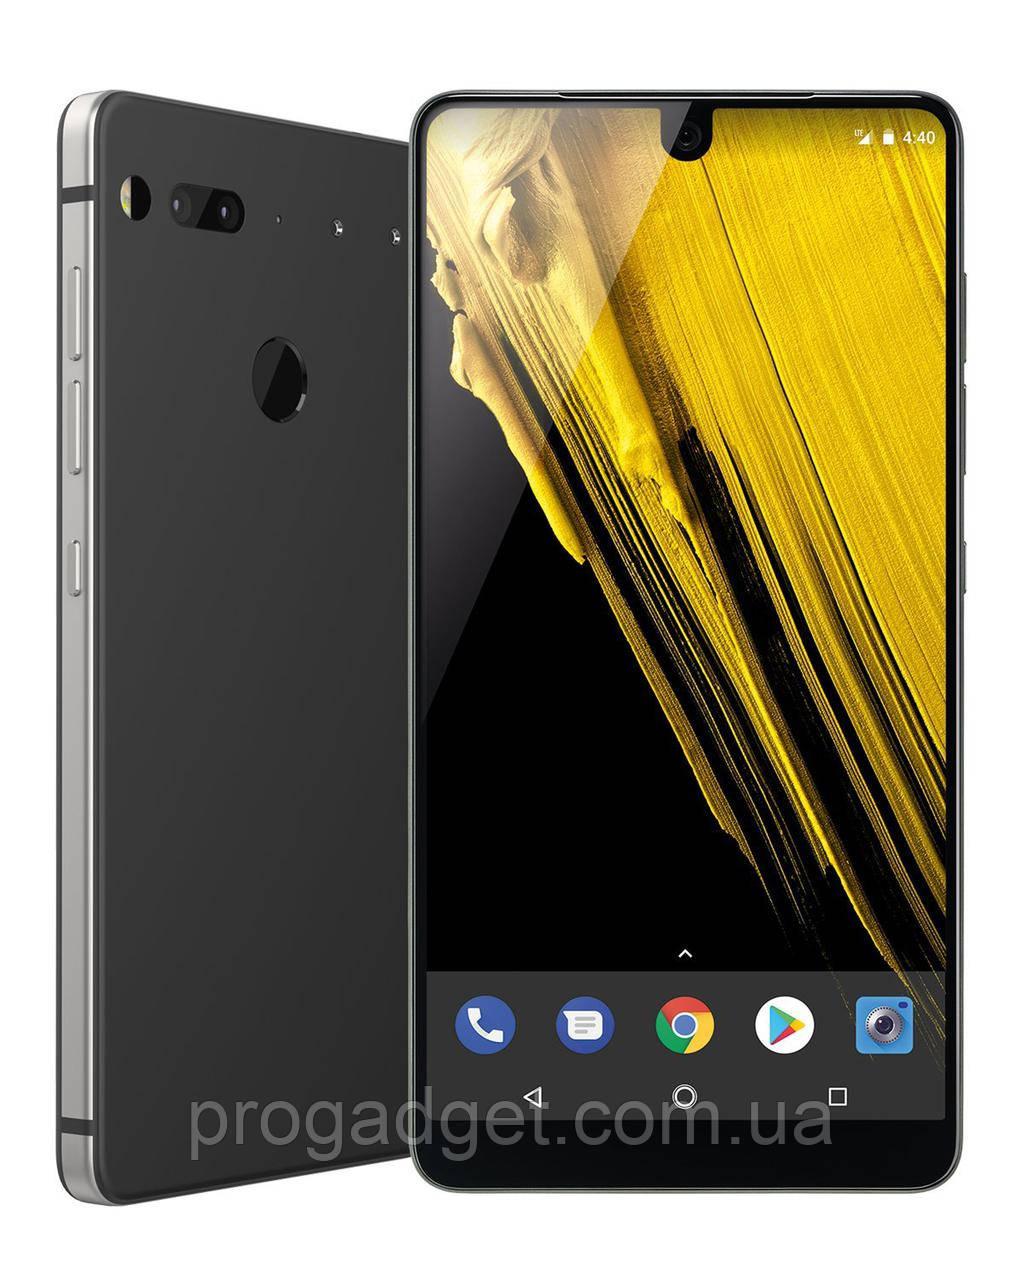 Essential Phone – 128 GB Titan + Керамика - Элитный безрамочный смартфон от Энди Рубина!